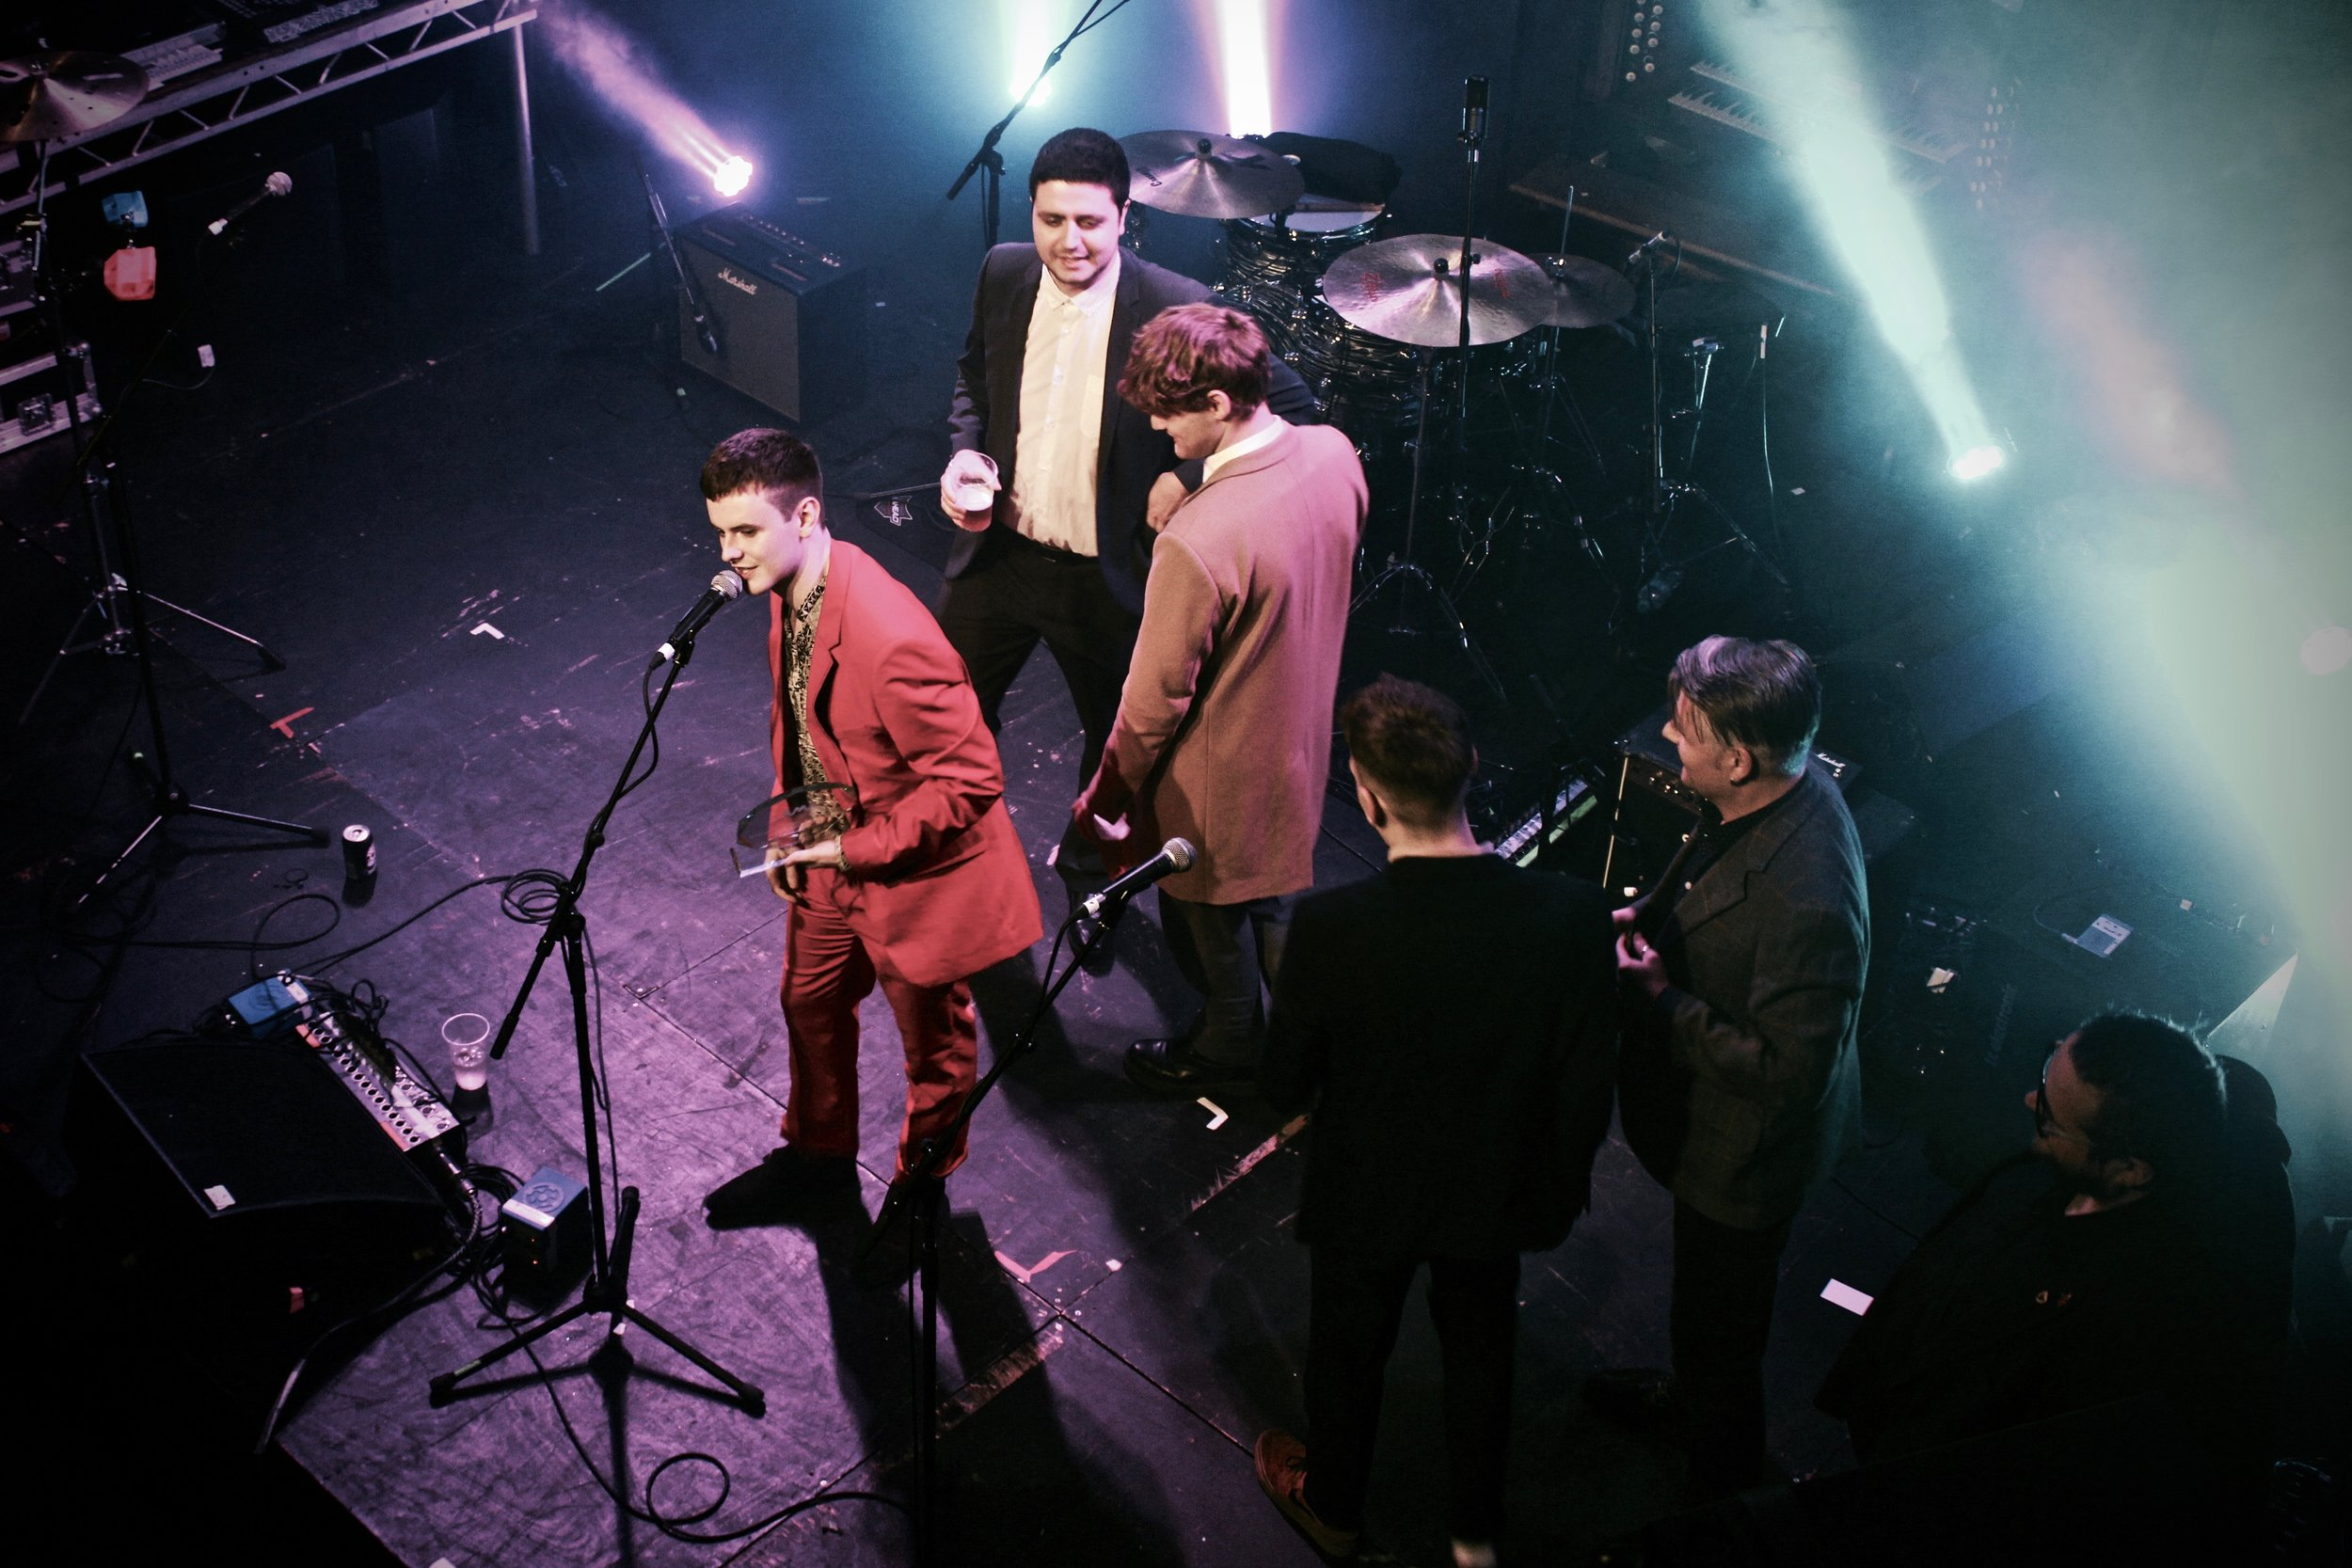 Declan Welsh & The Decadent West winning Best Rock/Alternative in 2018.